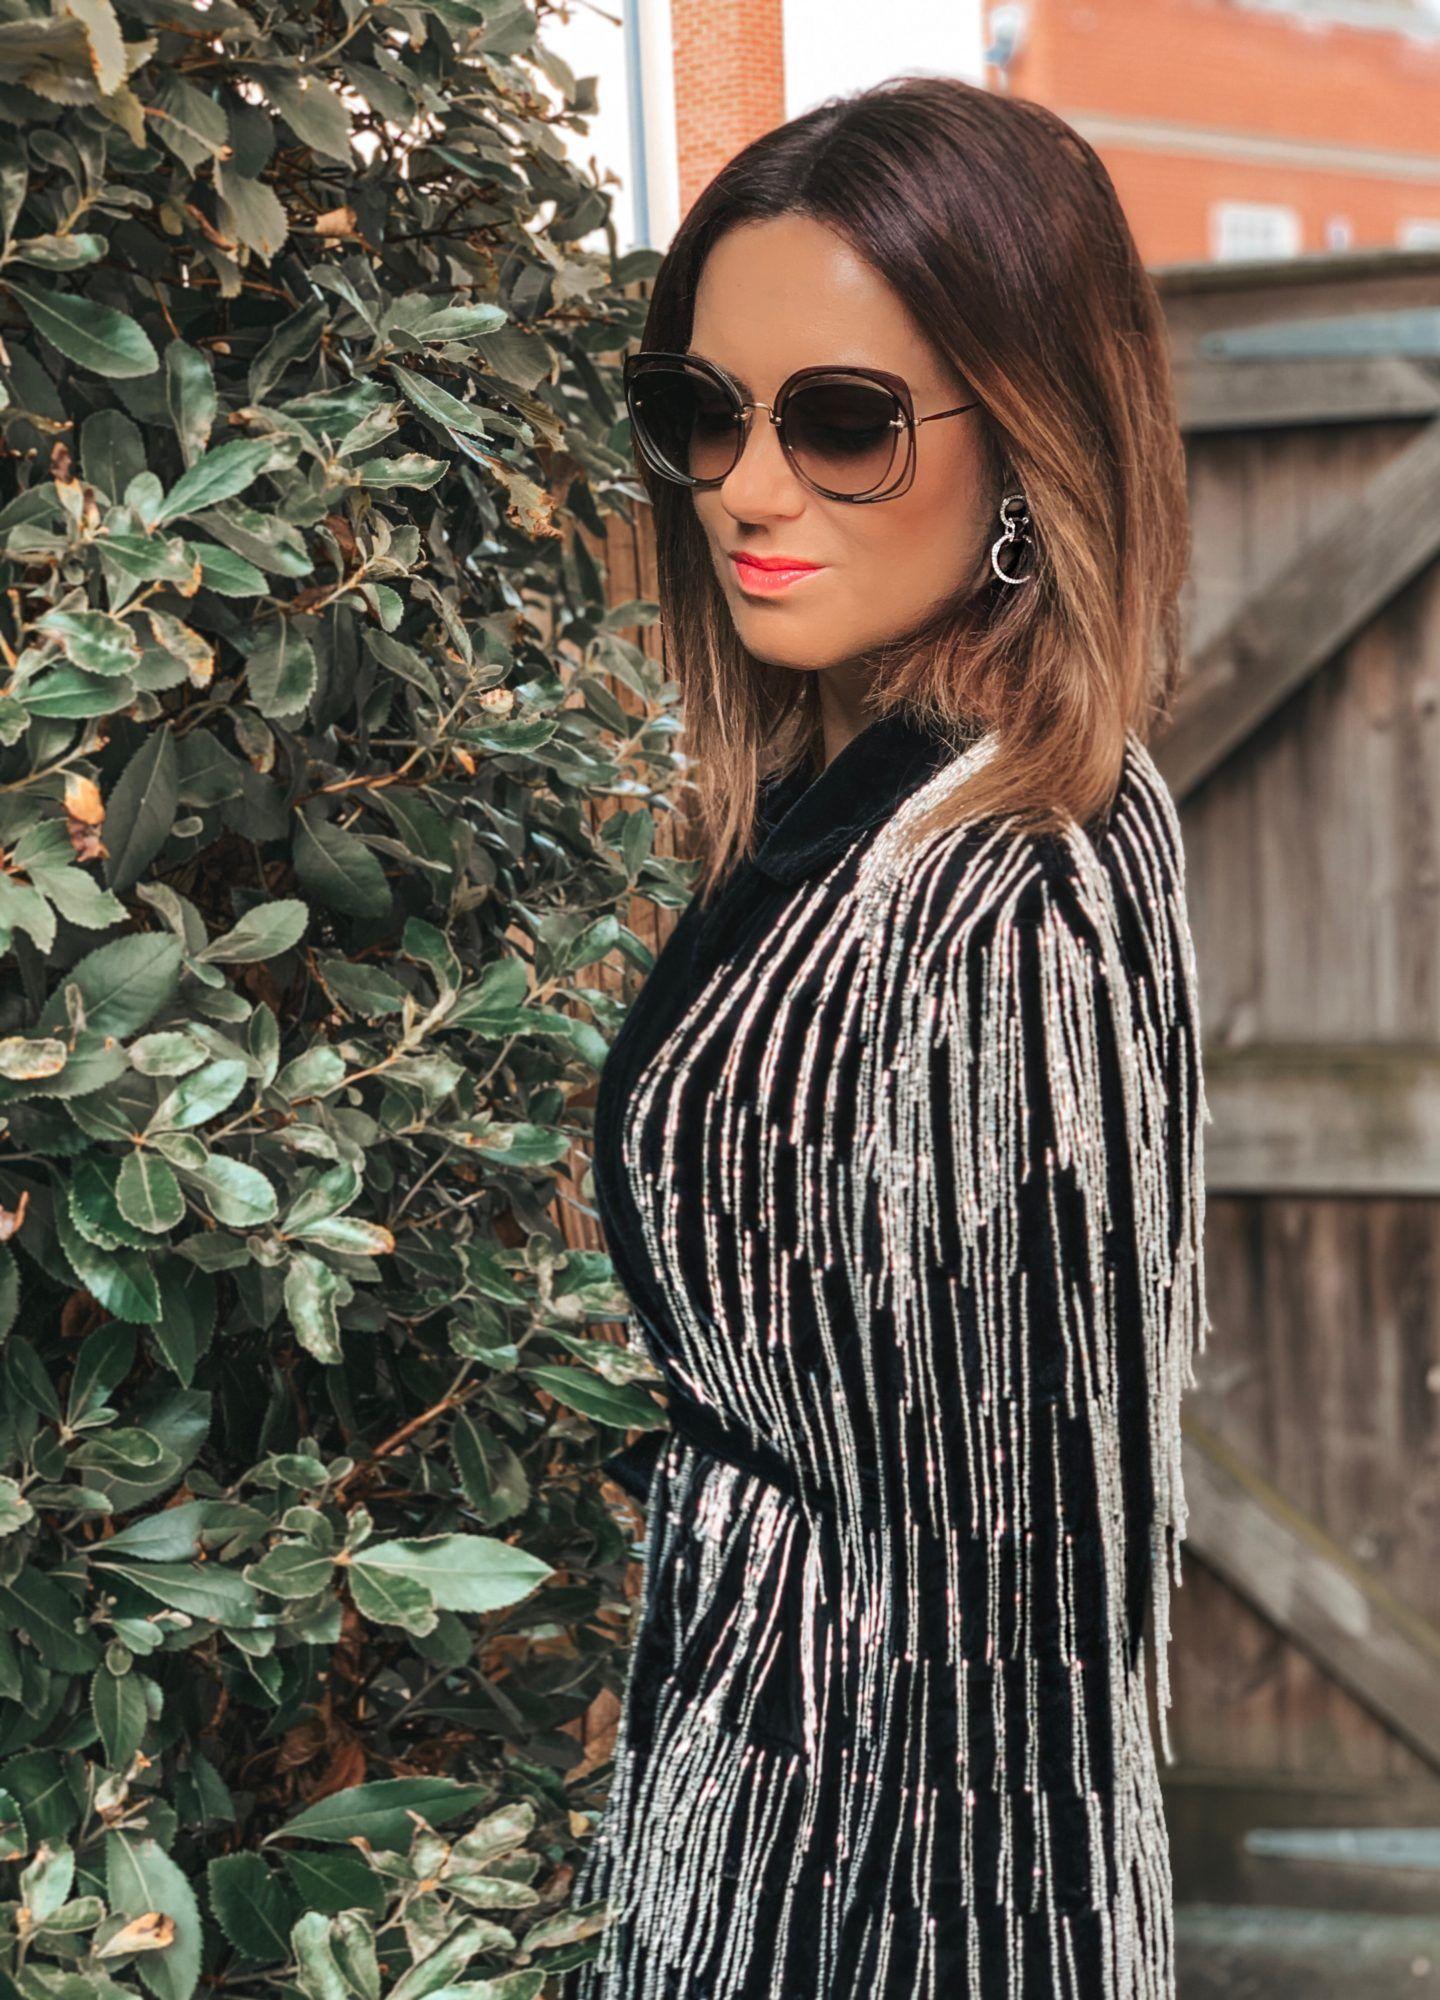 ASOS EDITION velvet beaded fringe blazer | Swarovski MERRY PIERCED EARRING JACKETS | BOSS Black Jeans | Miu Miu sunglasses